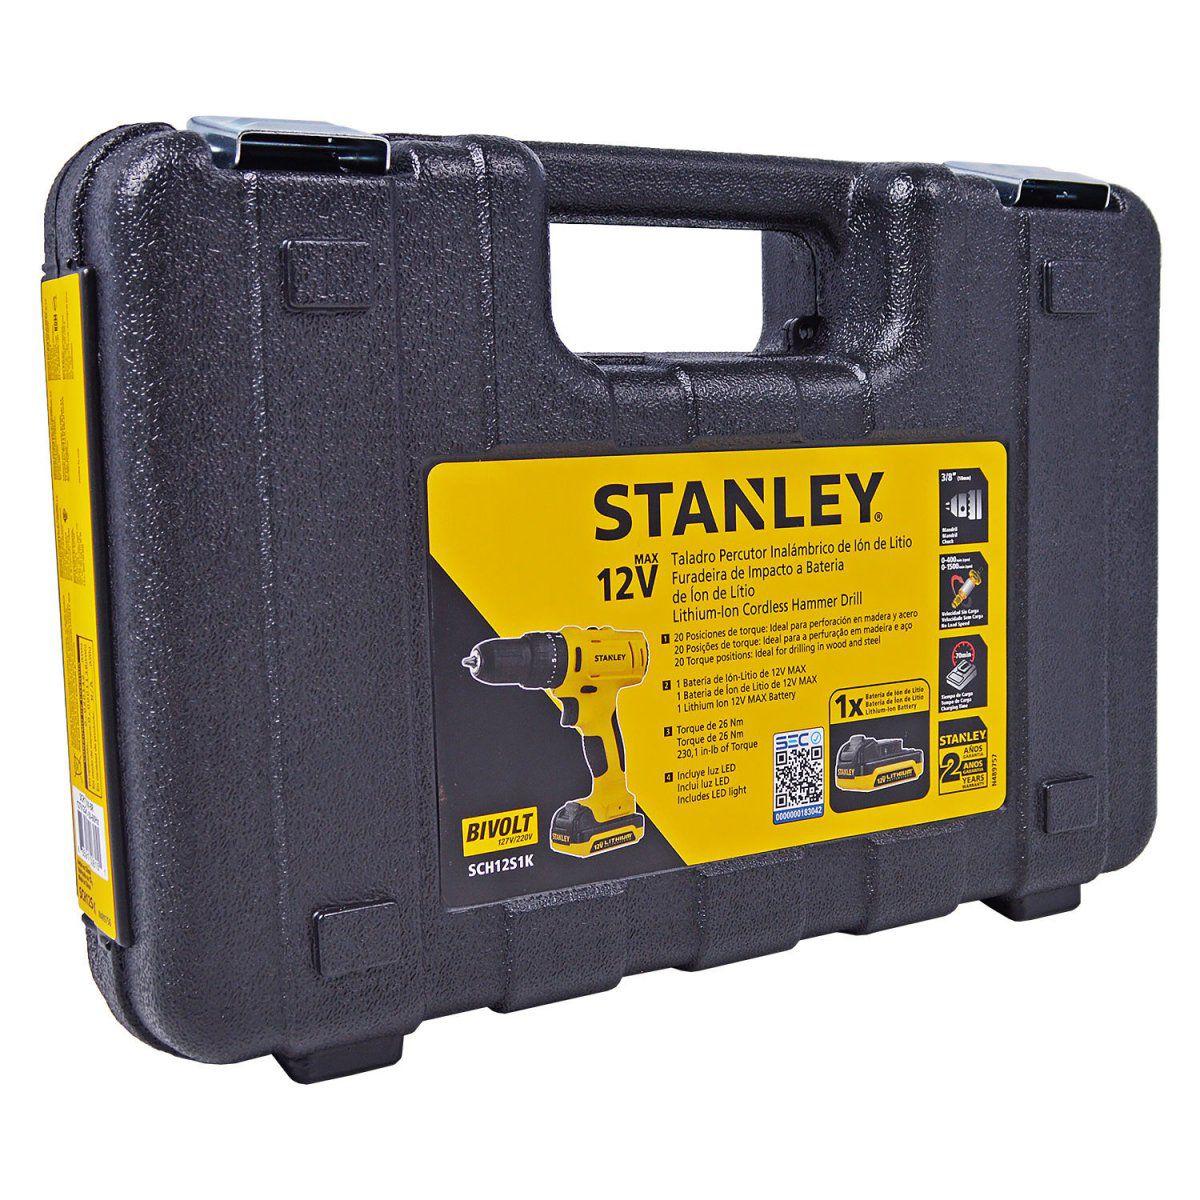 Furadeira Impacto Parafusadeira Stanley Bateria Lítio 12V Bivolt